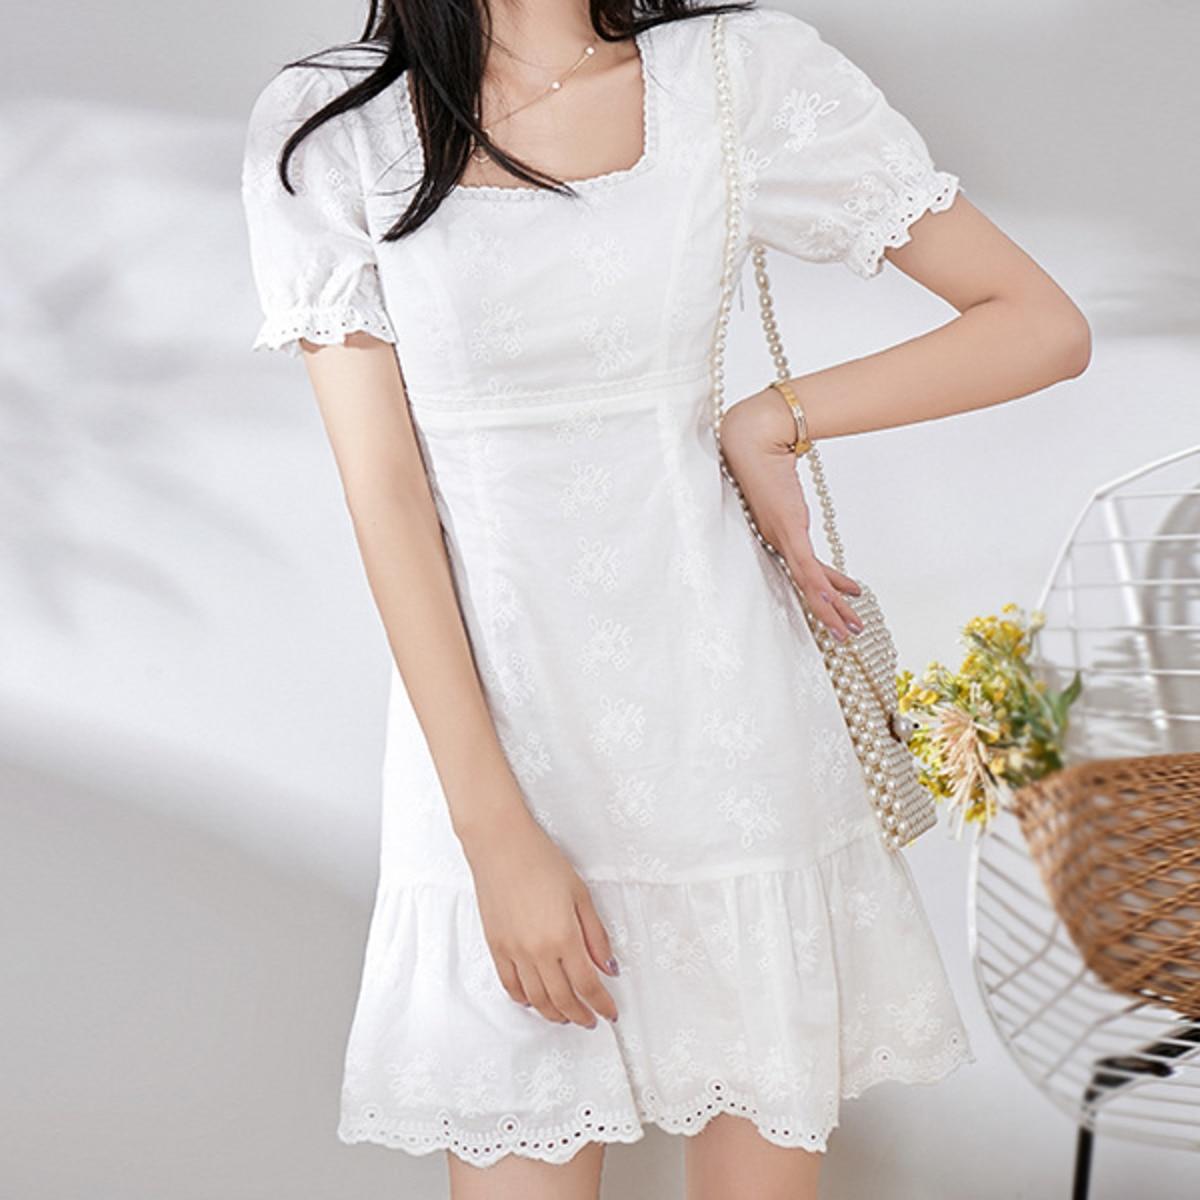 Fashion Women Sexy Square Collar White Lace Dress Romantic Lady Short Sleeve A-line Mini Cocktail Dress Summer Платье Вечернее